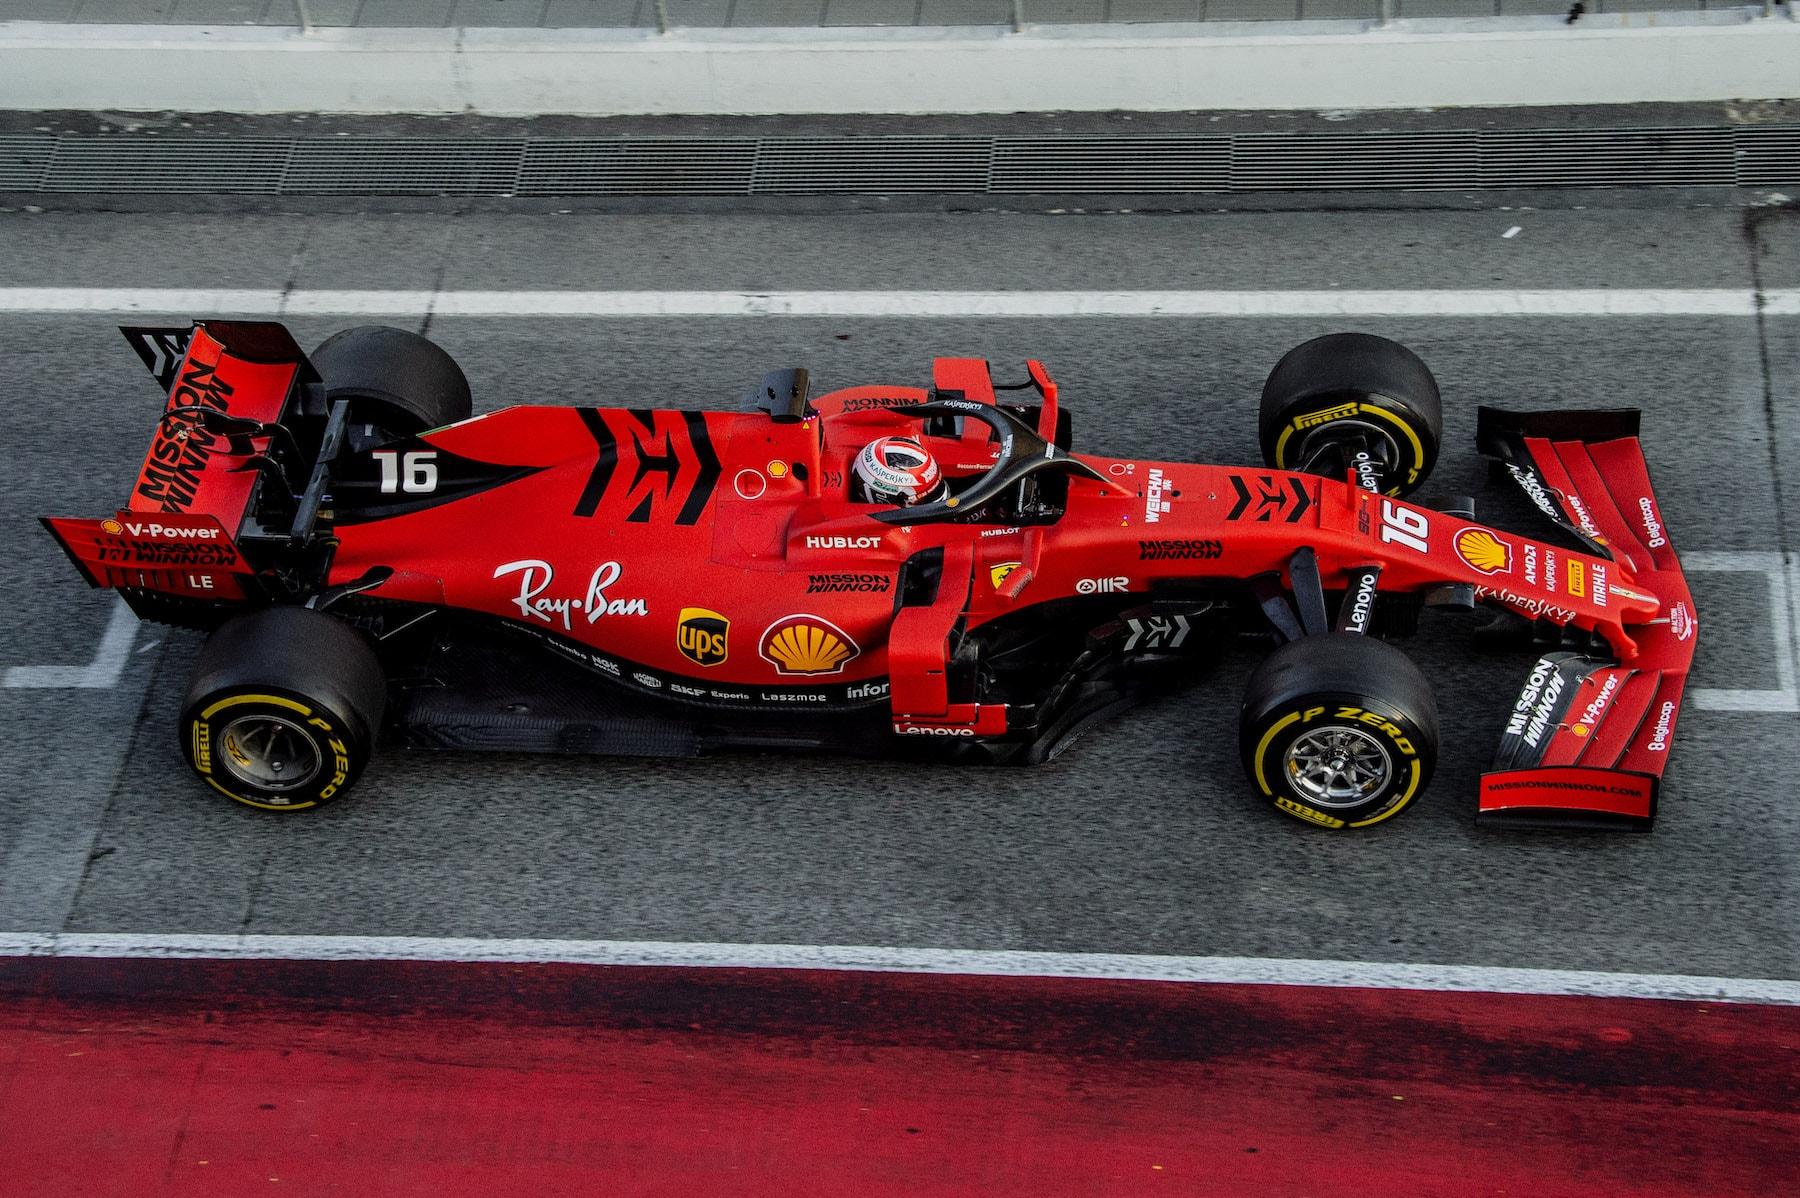 2019 Charles Leclerc | Ferrari SF90 | 2019 Barcelona T2 D3 1.jpg